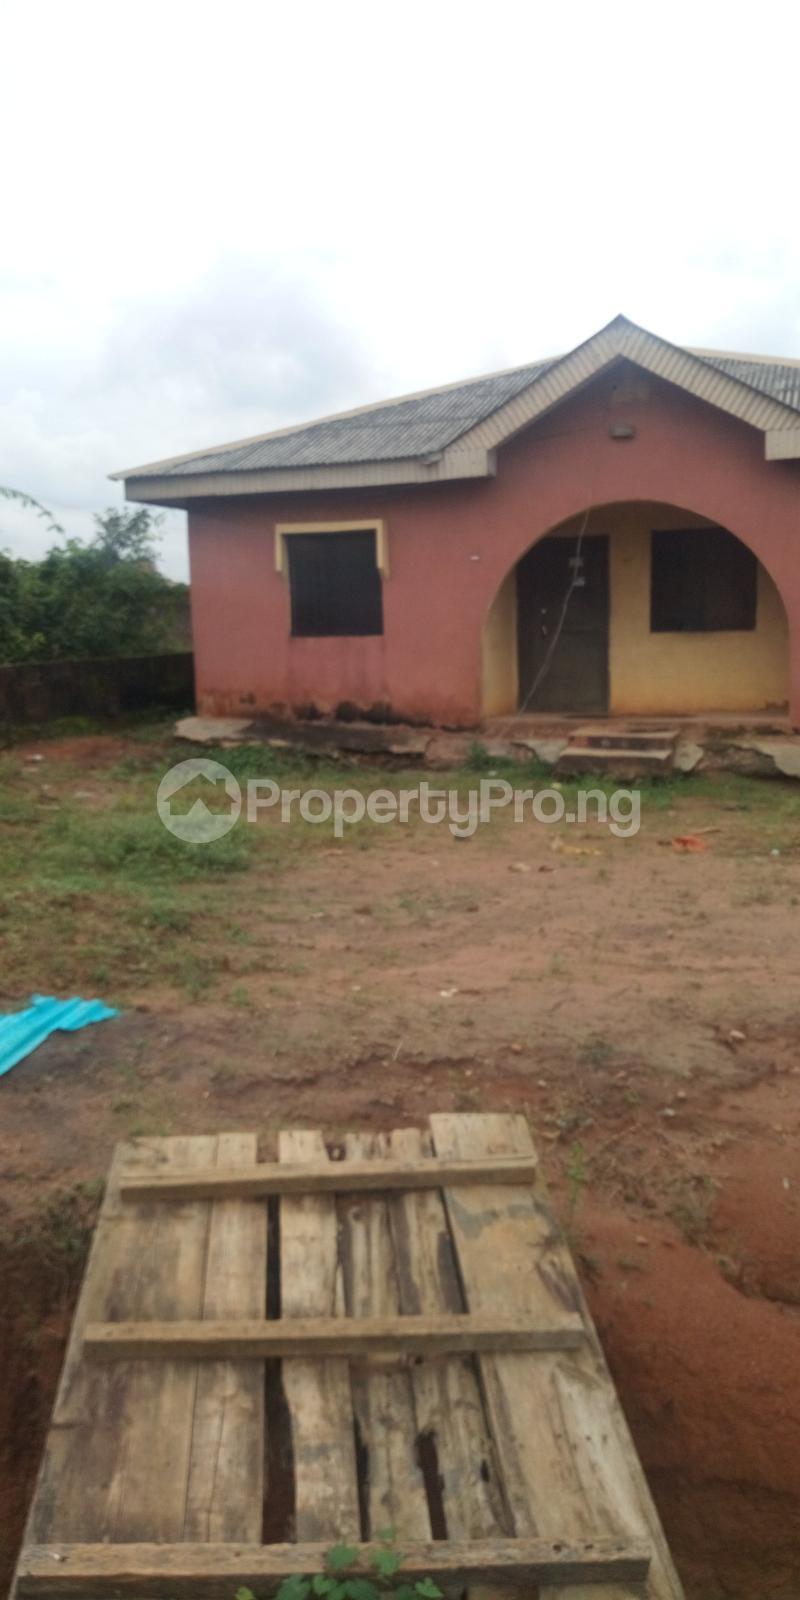 3 bedroom Detached Bungalow House for sale Ige Est kola command rd Ipaja Lagos  Ipaja road Ipaja Lagos - 1